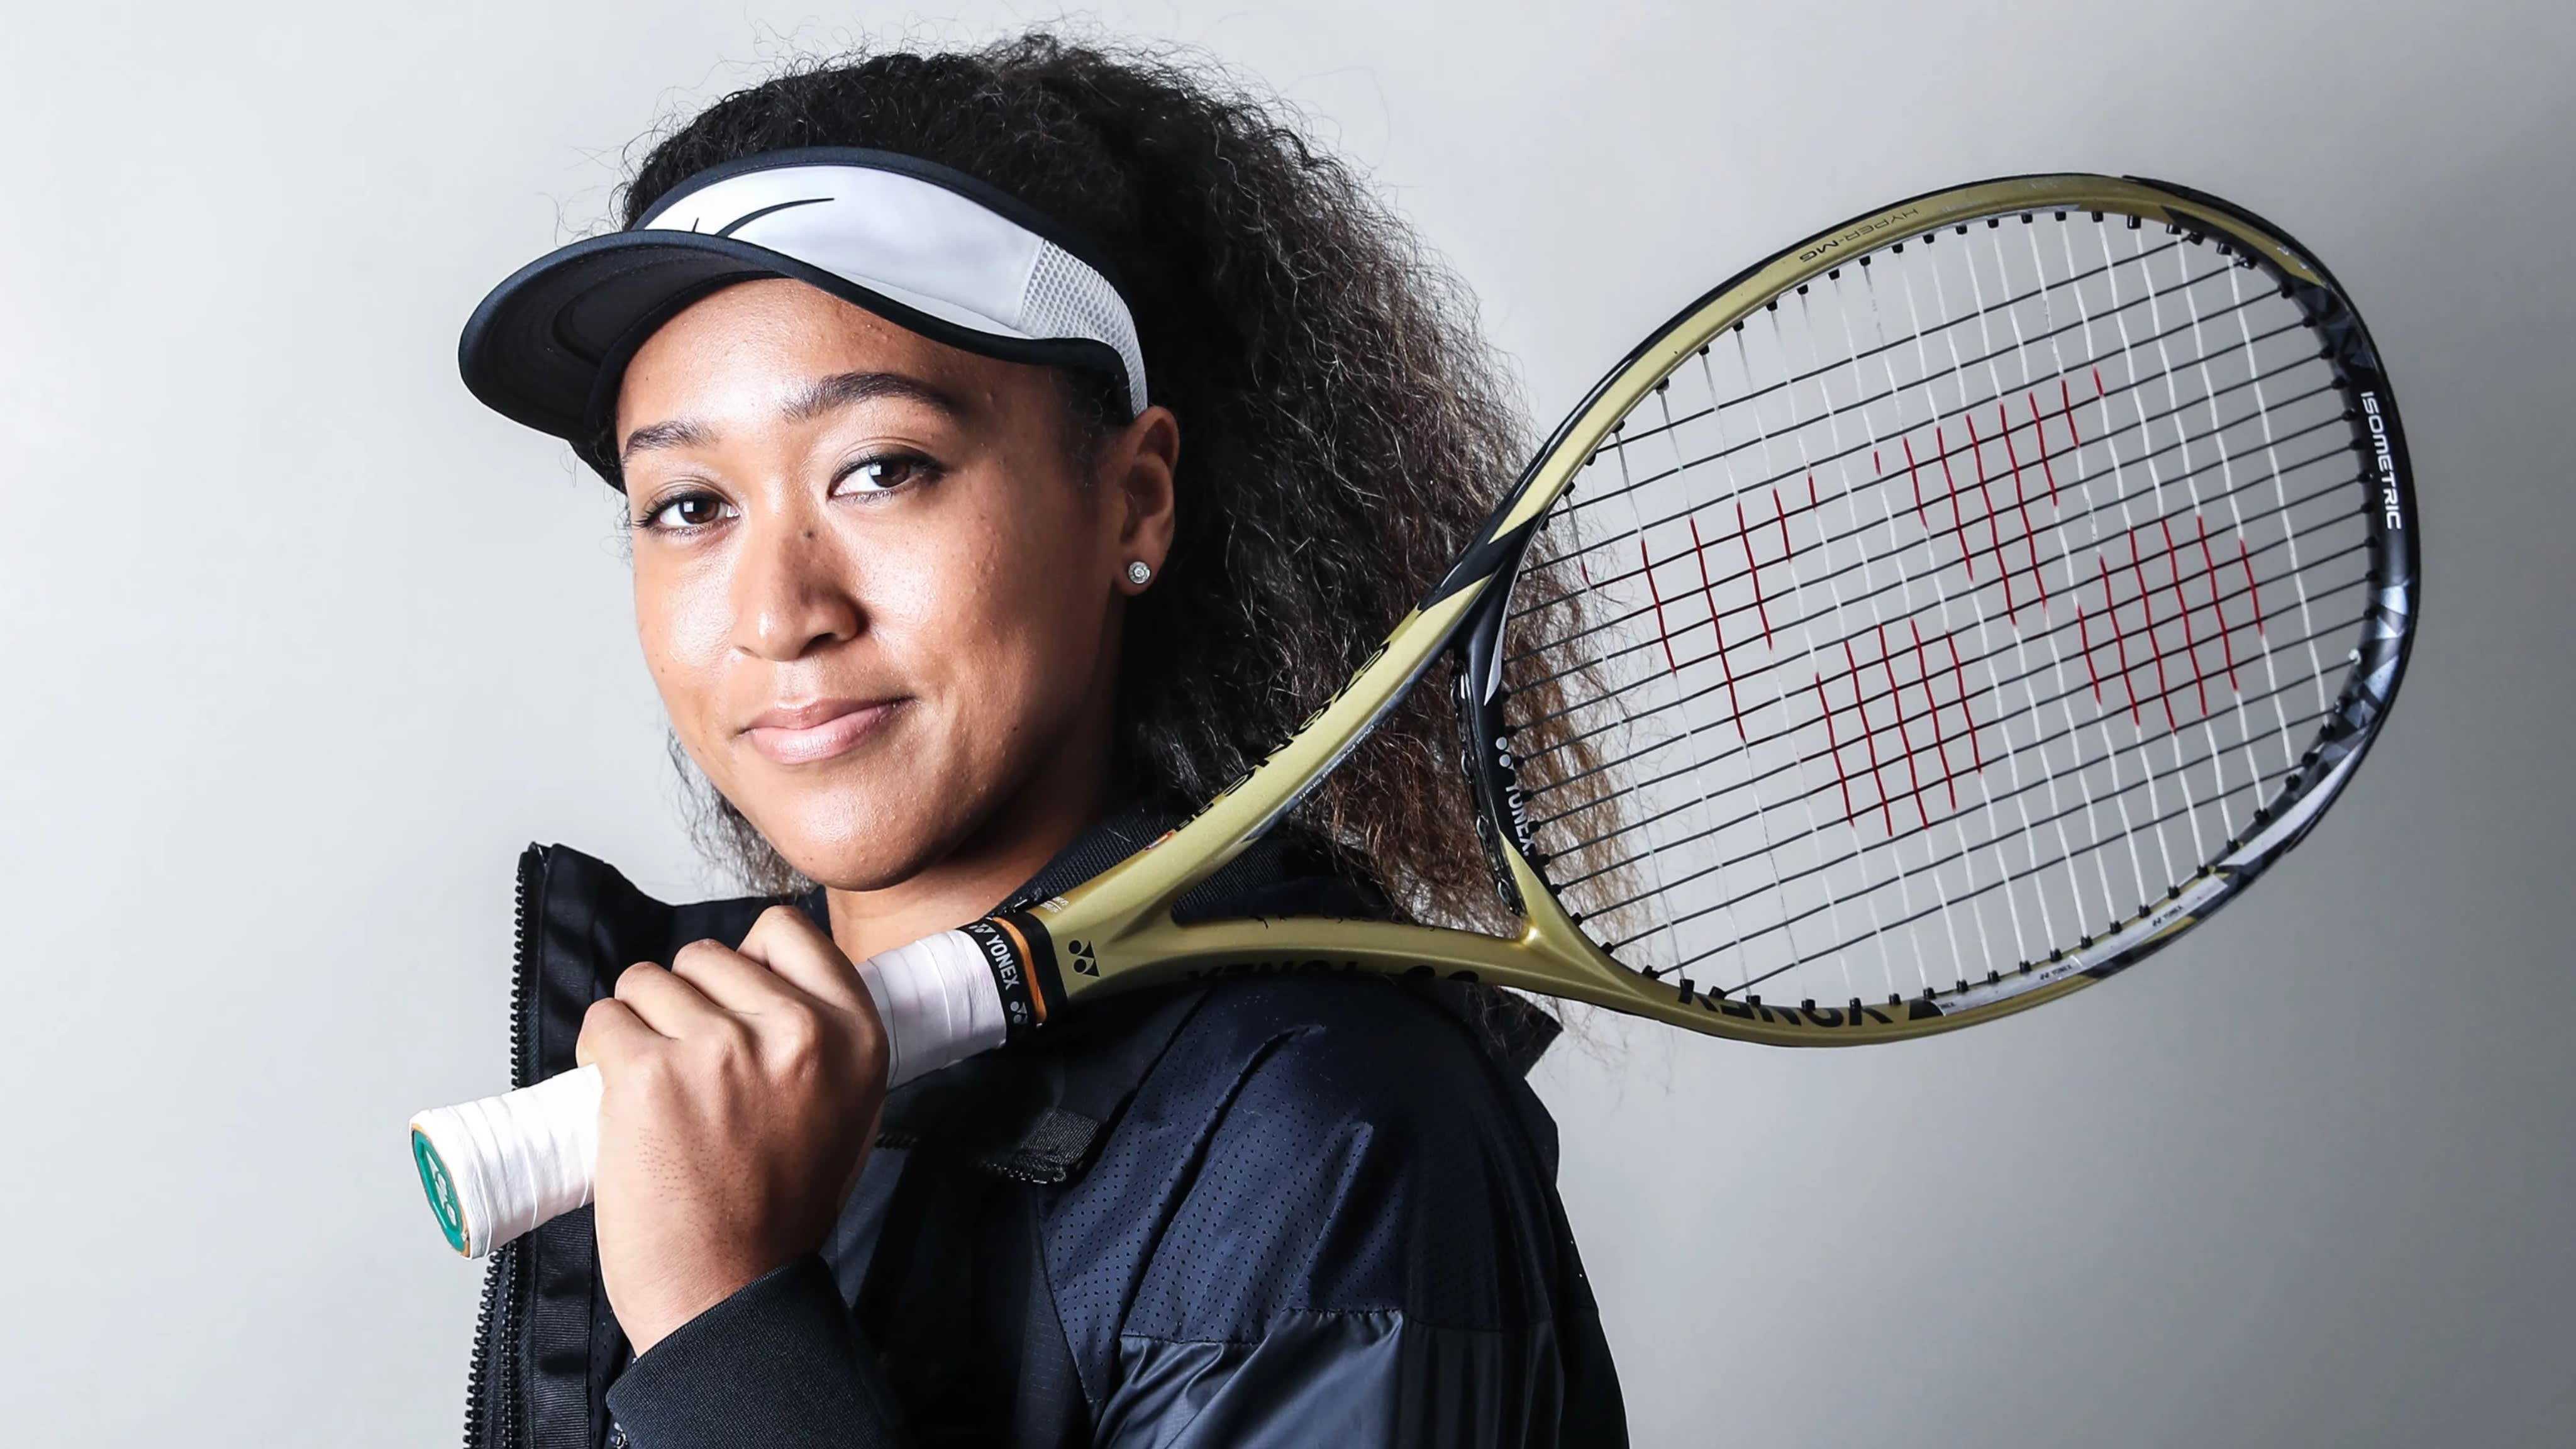 Download Naomi Osaka Tennis Gif